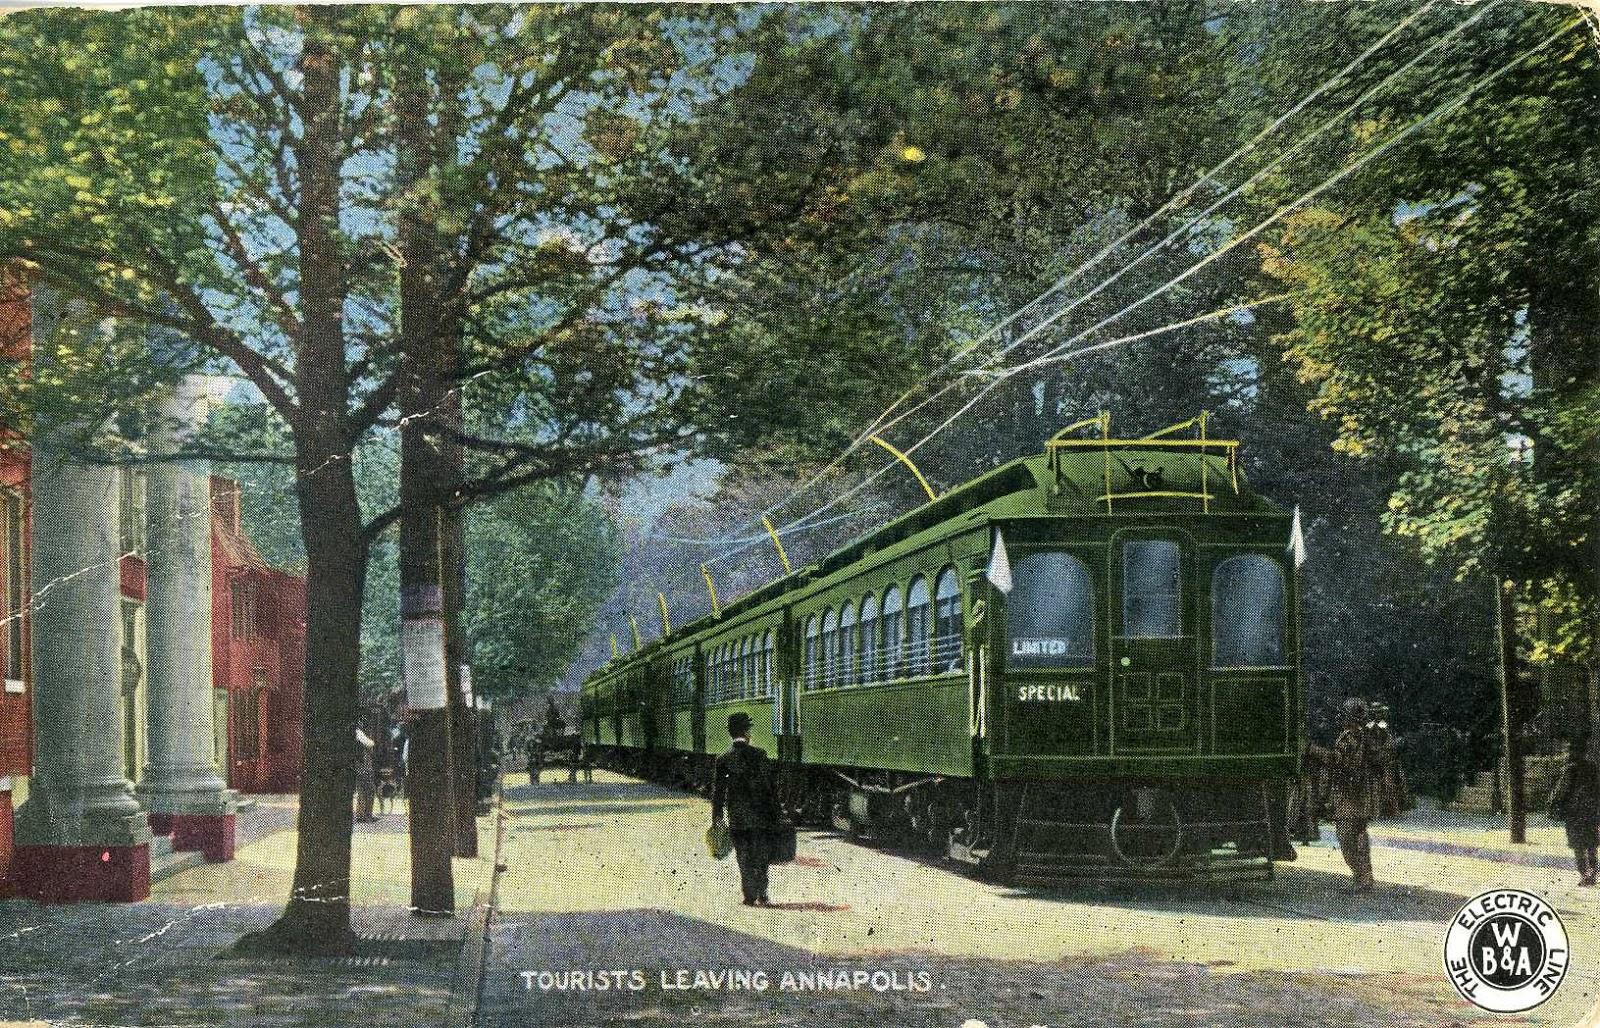 Washington-Baltimore-and-Annapolis-Railroad-Annapolis-Streets-1.jpg